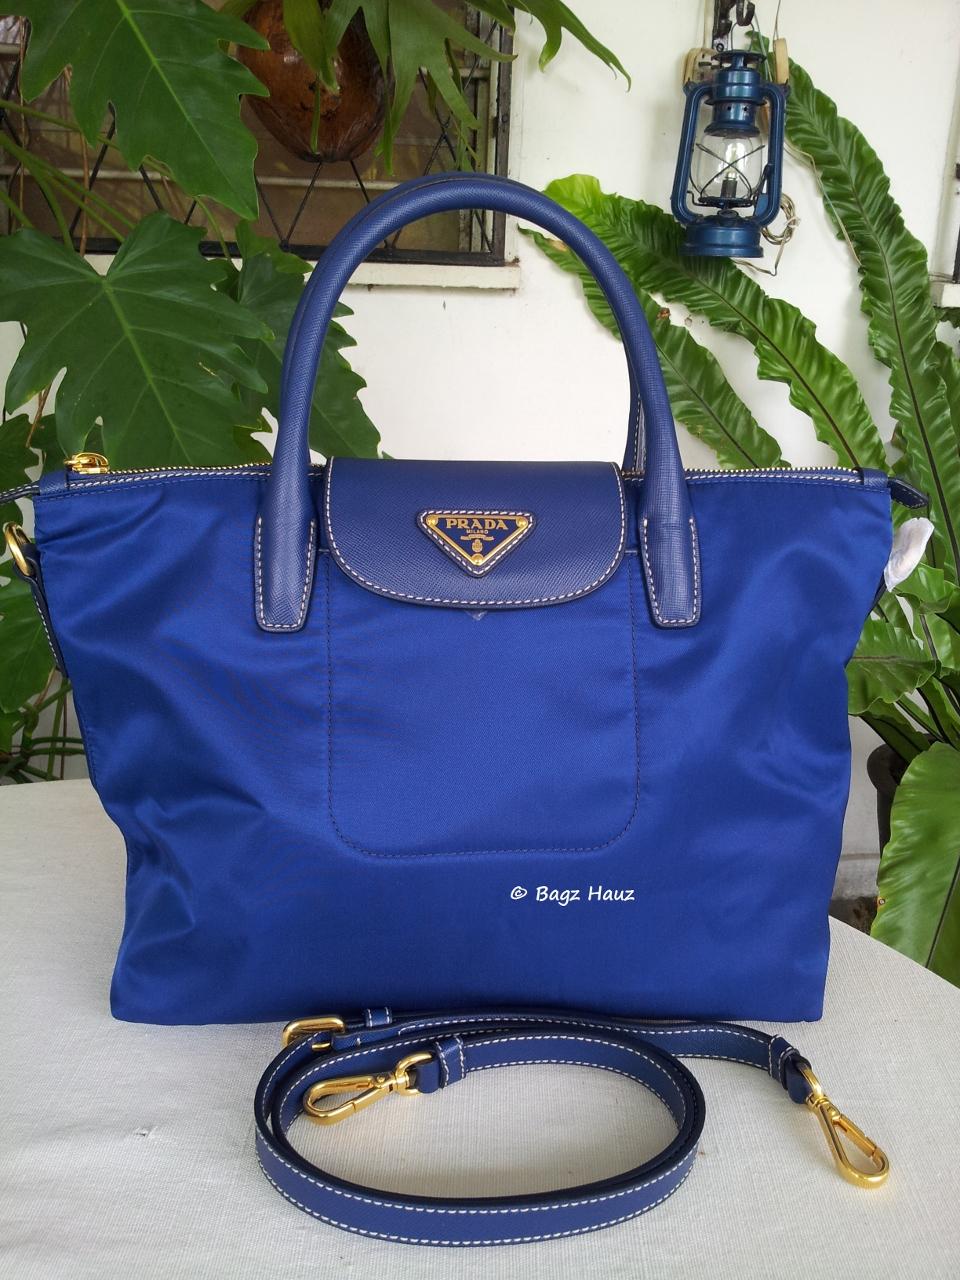 Bagz Hauz Fashion: PRADA ~ Ready Stocks in KL (**SOLD-OUT**)